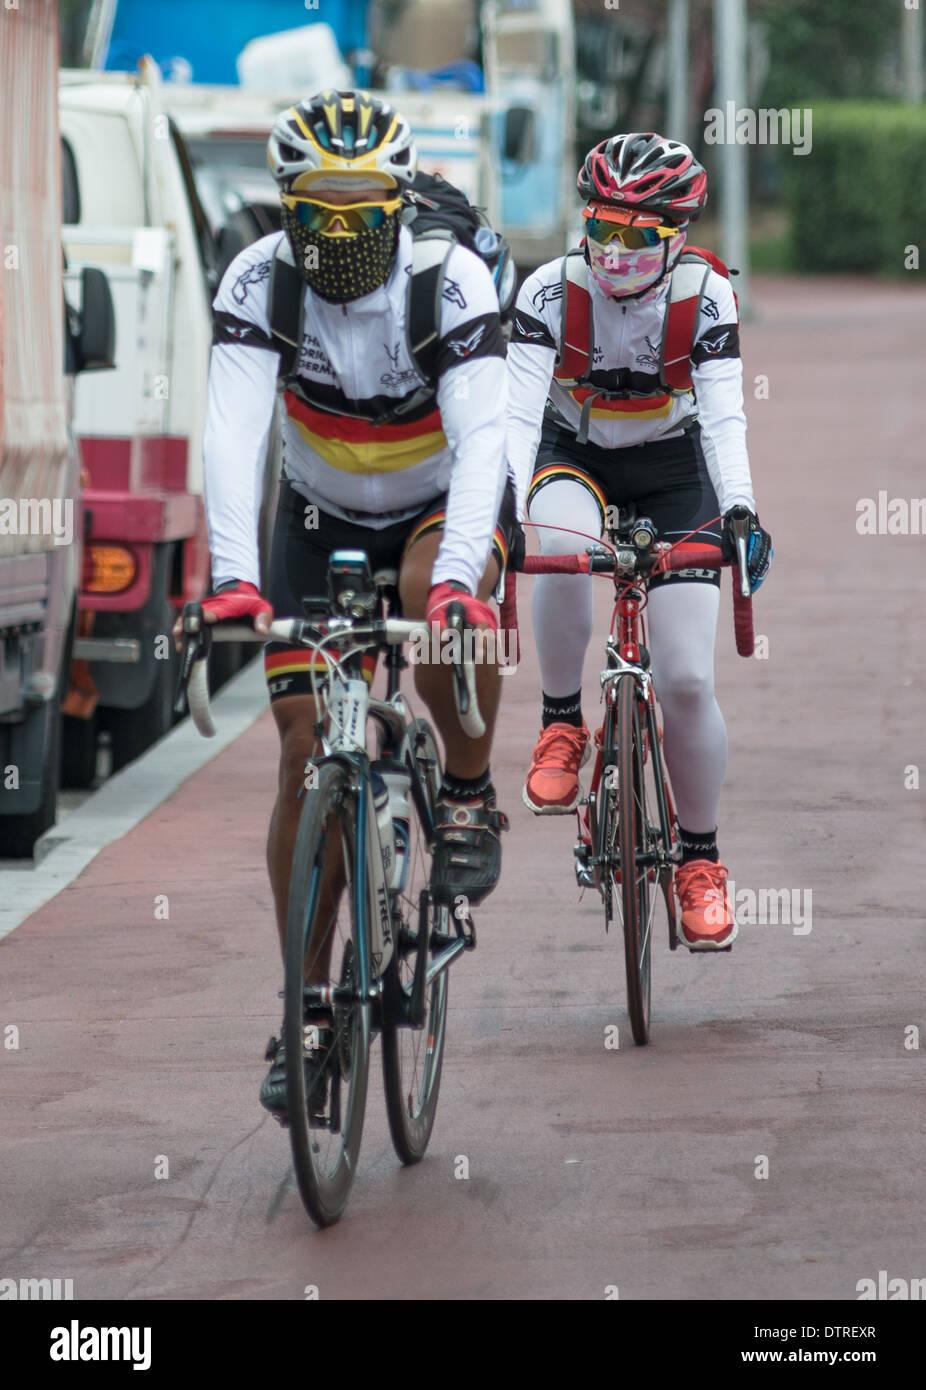 Masked South Korean Cyclists, Busan, South Korea, 2014 - Stock Image